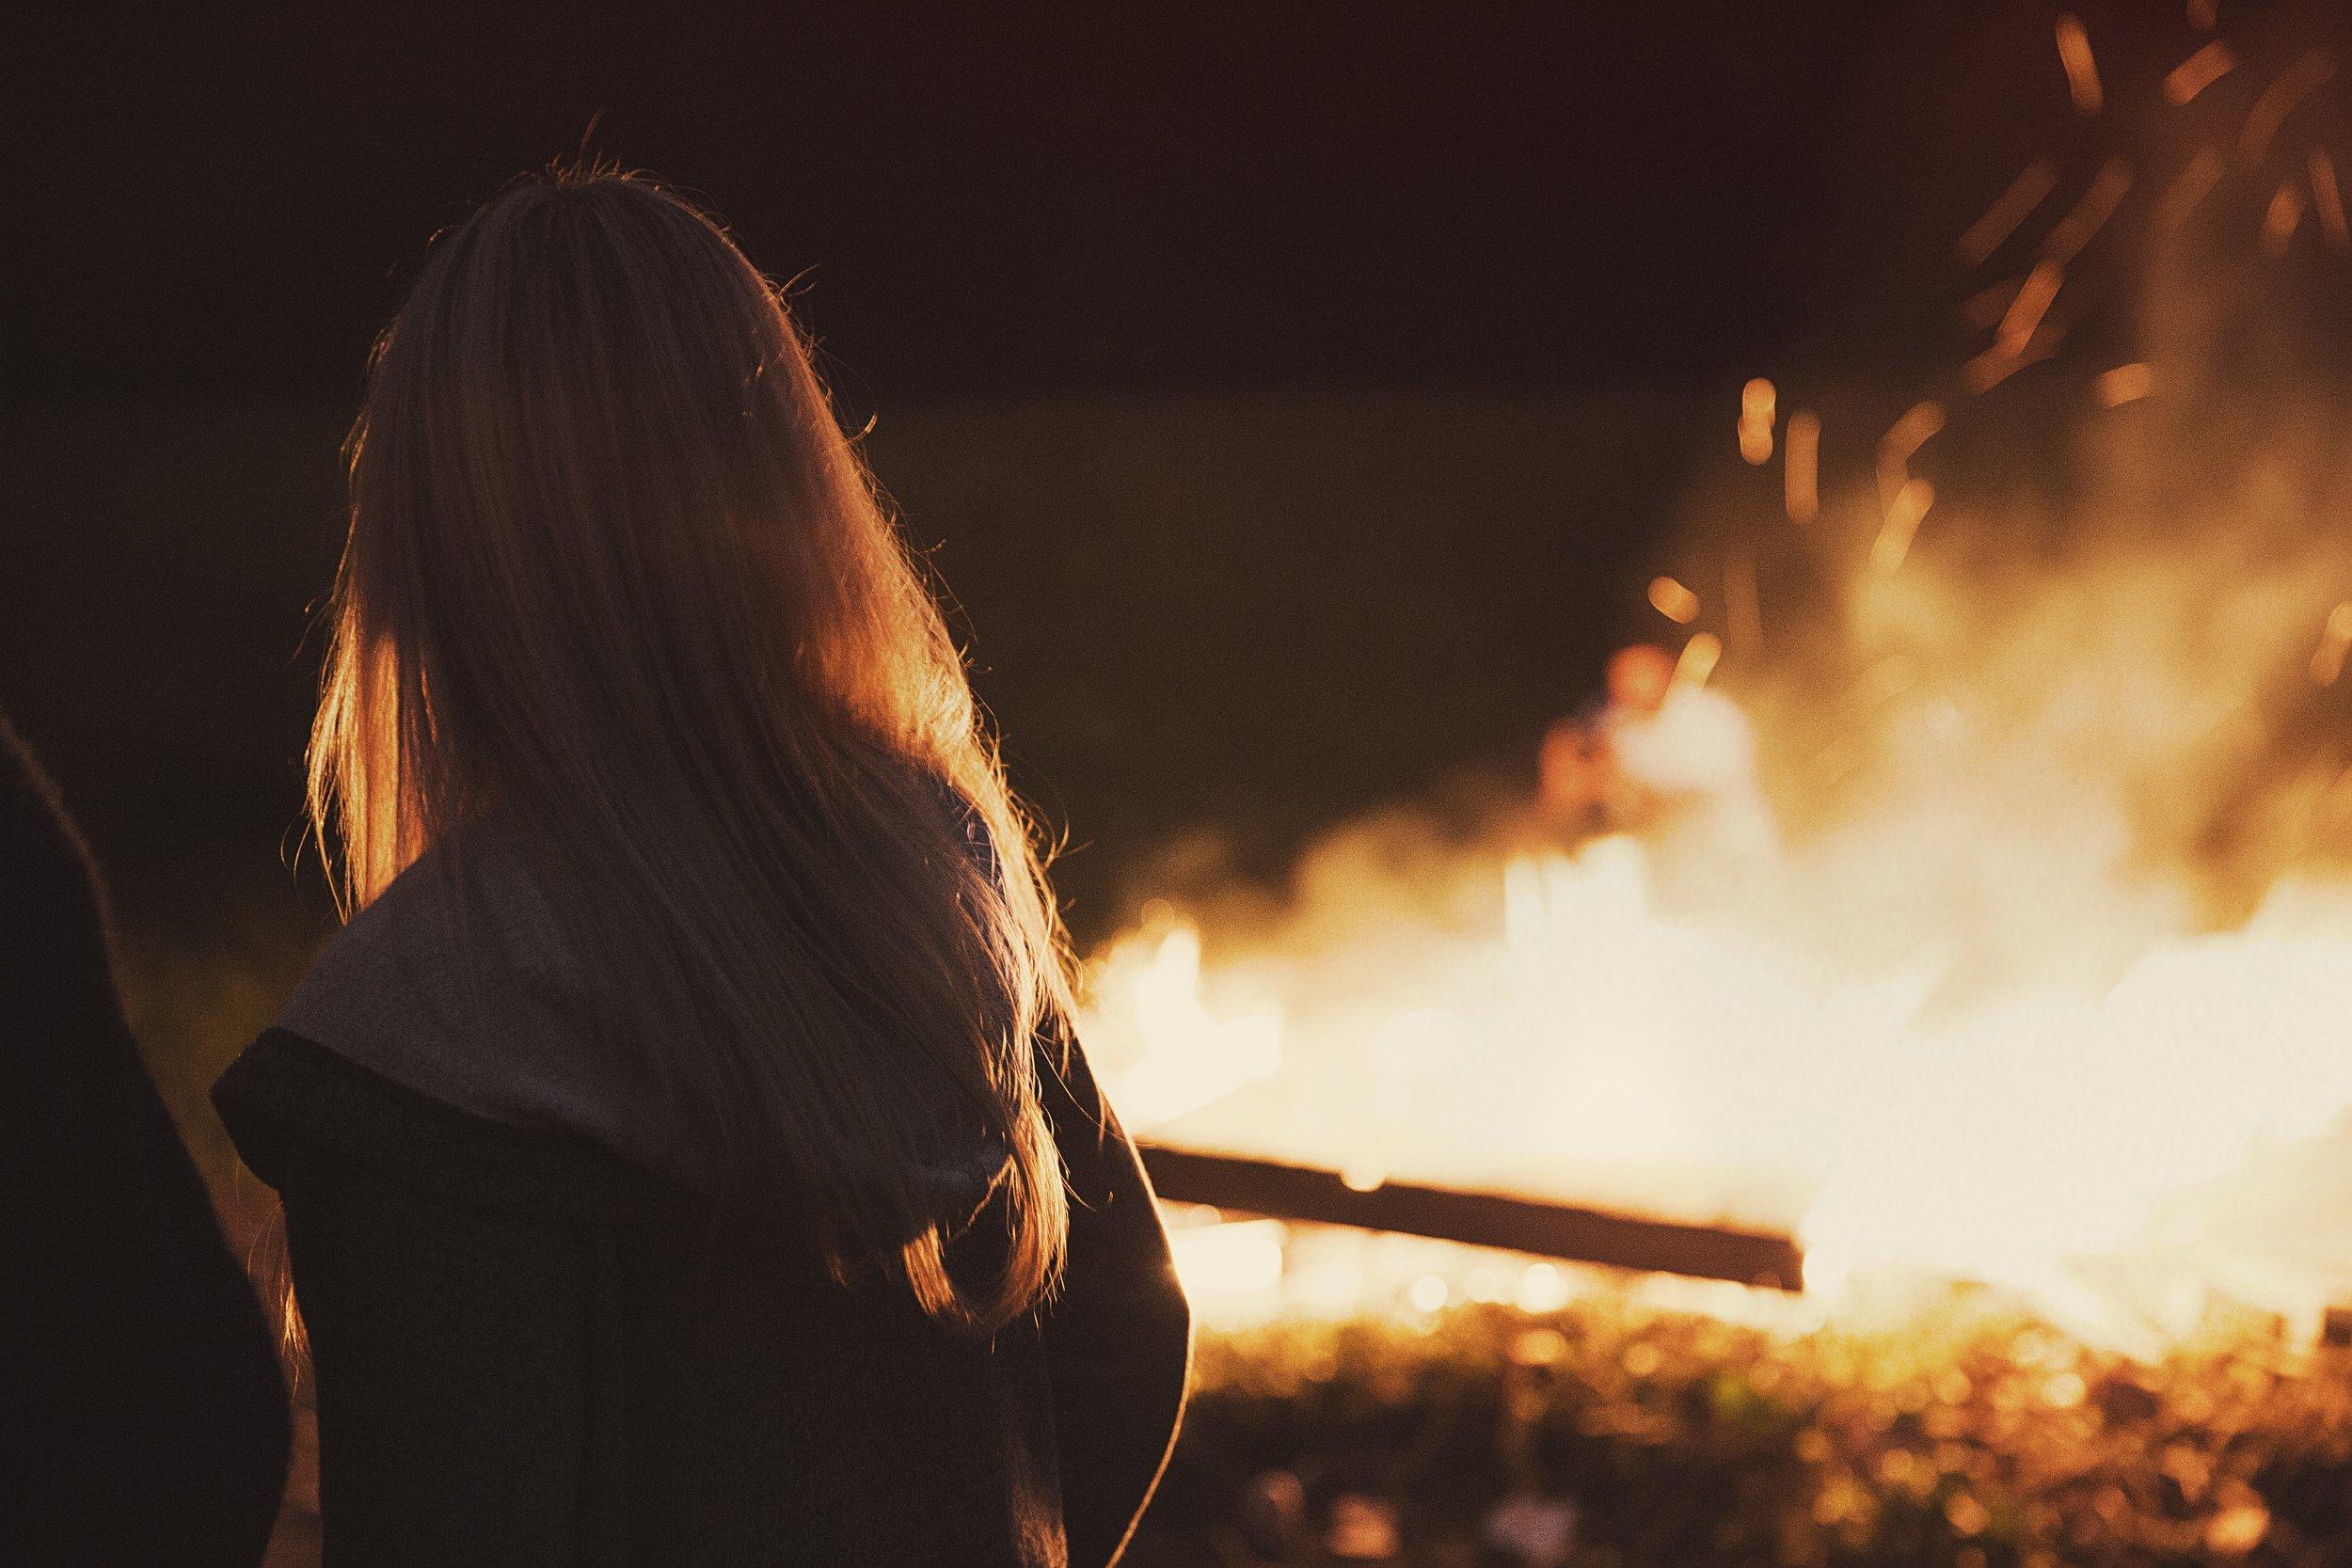 person-woman-night-fire.jpg